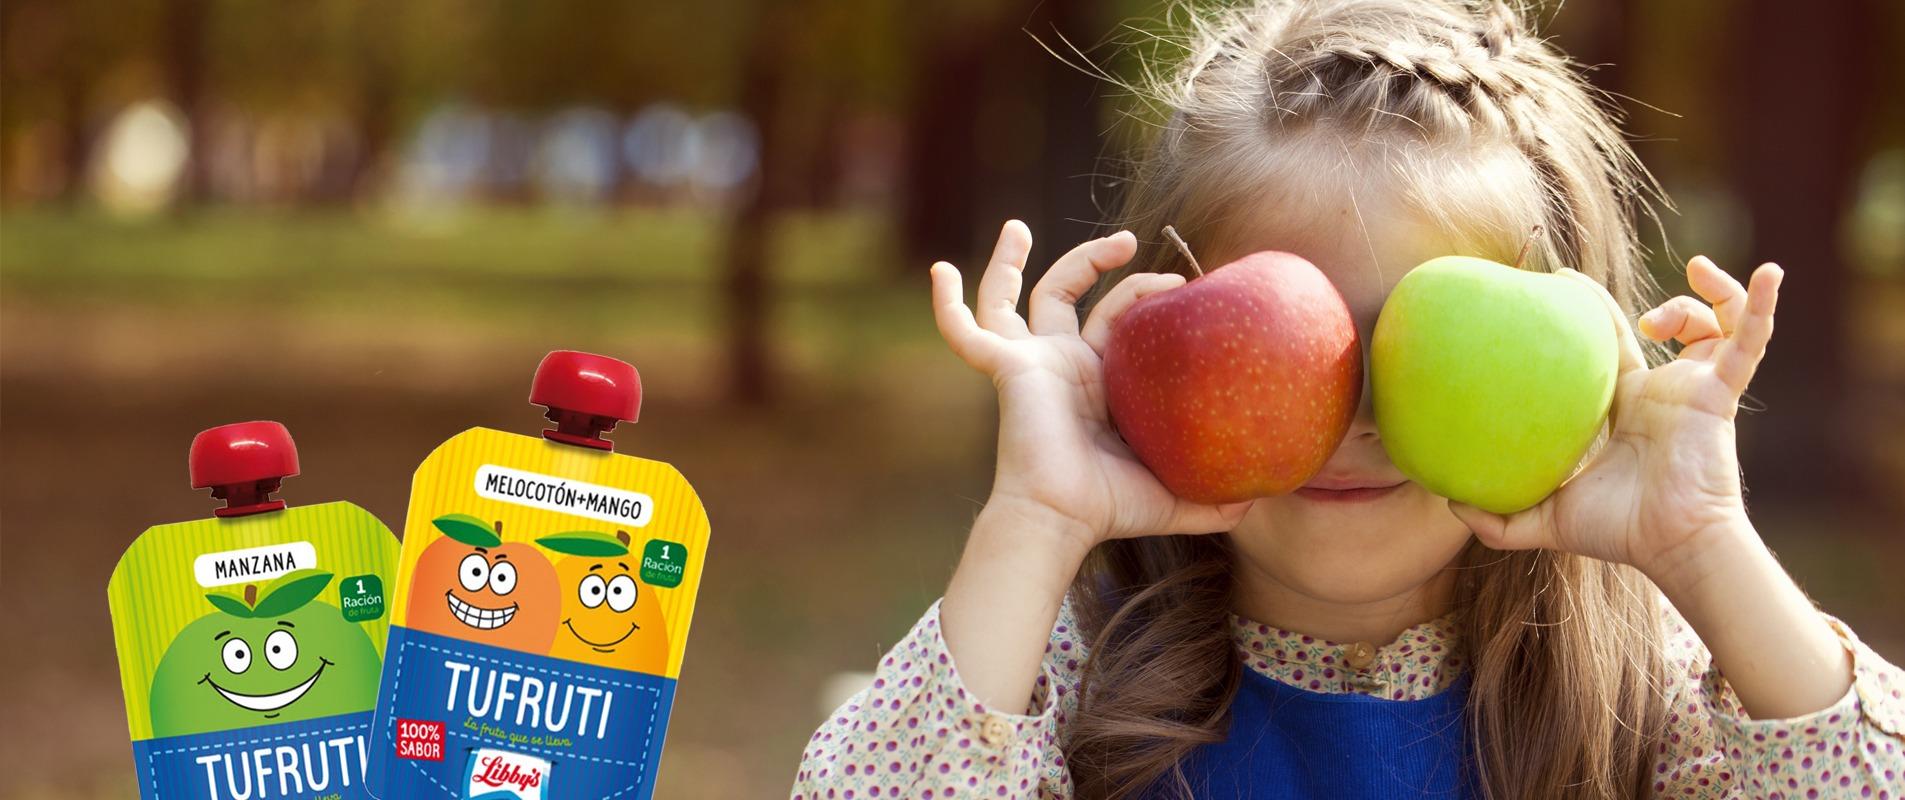 Tufruti, fruta para llevar